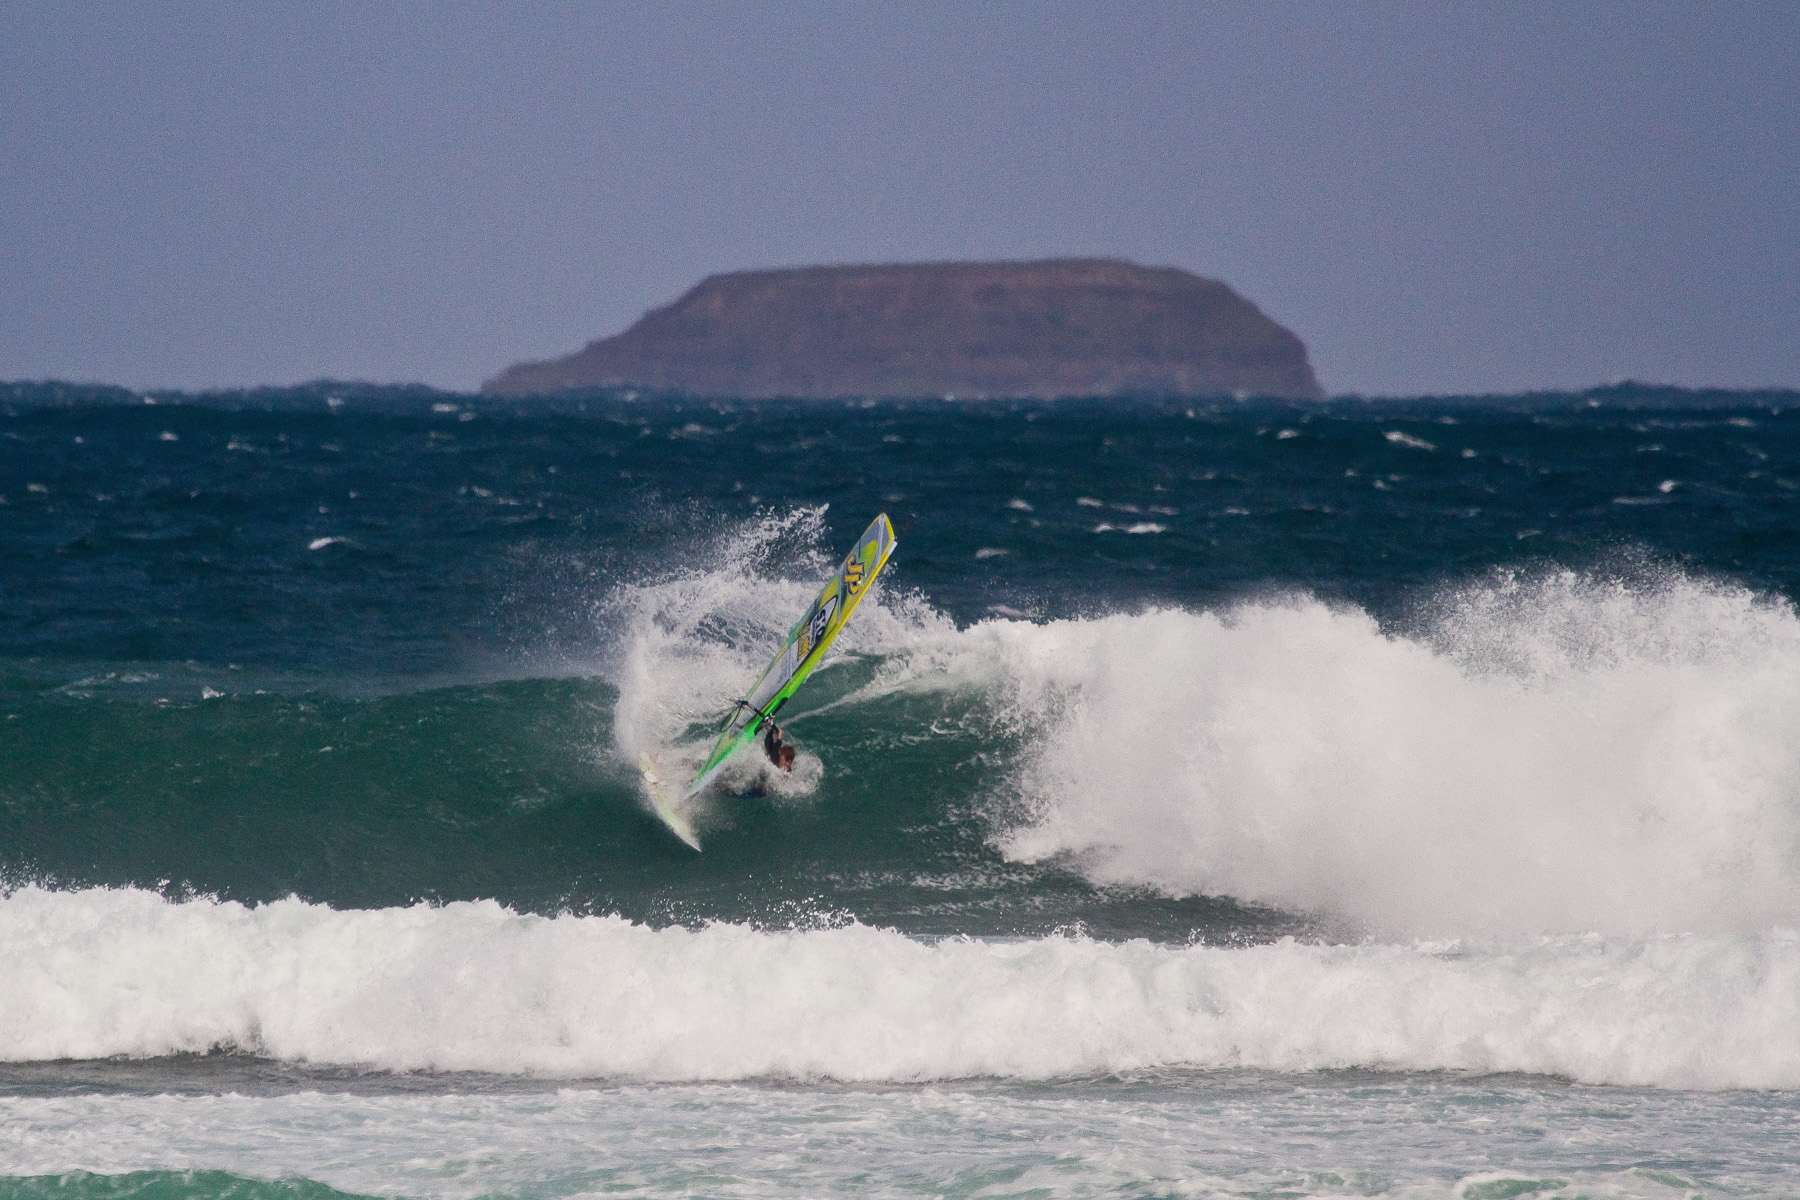 alastair mcleod windsurfing point leo suicide